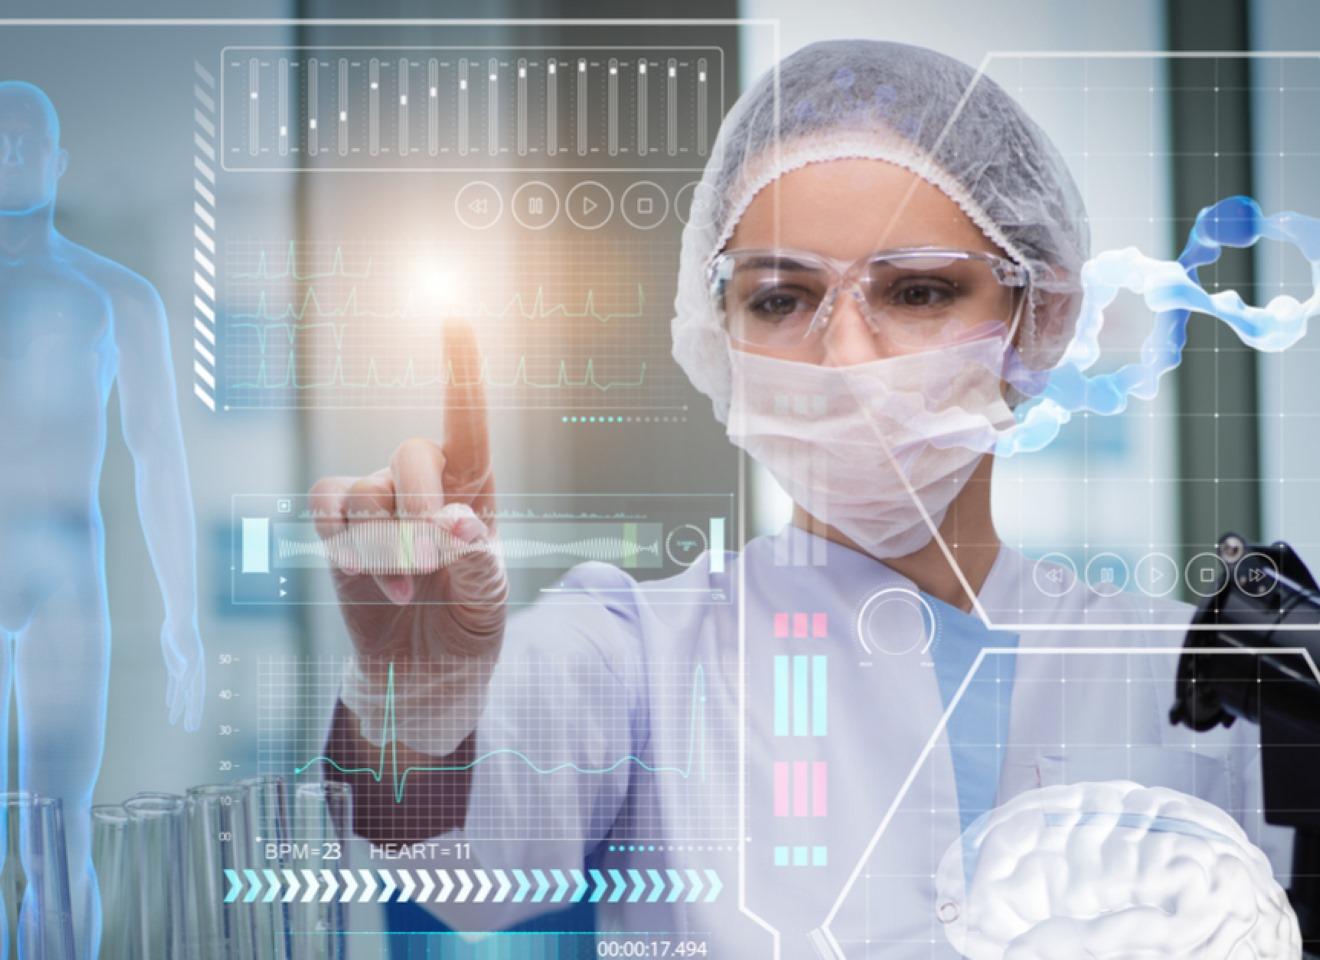 Kunstig intelligens i helsetjenester